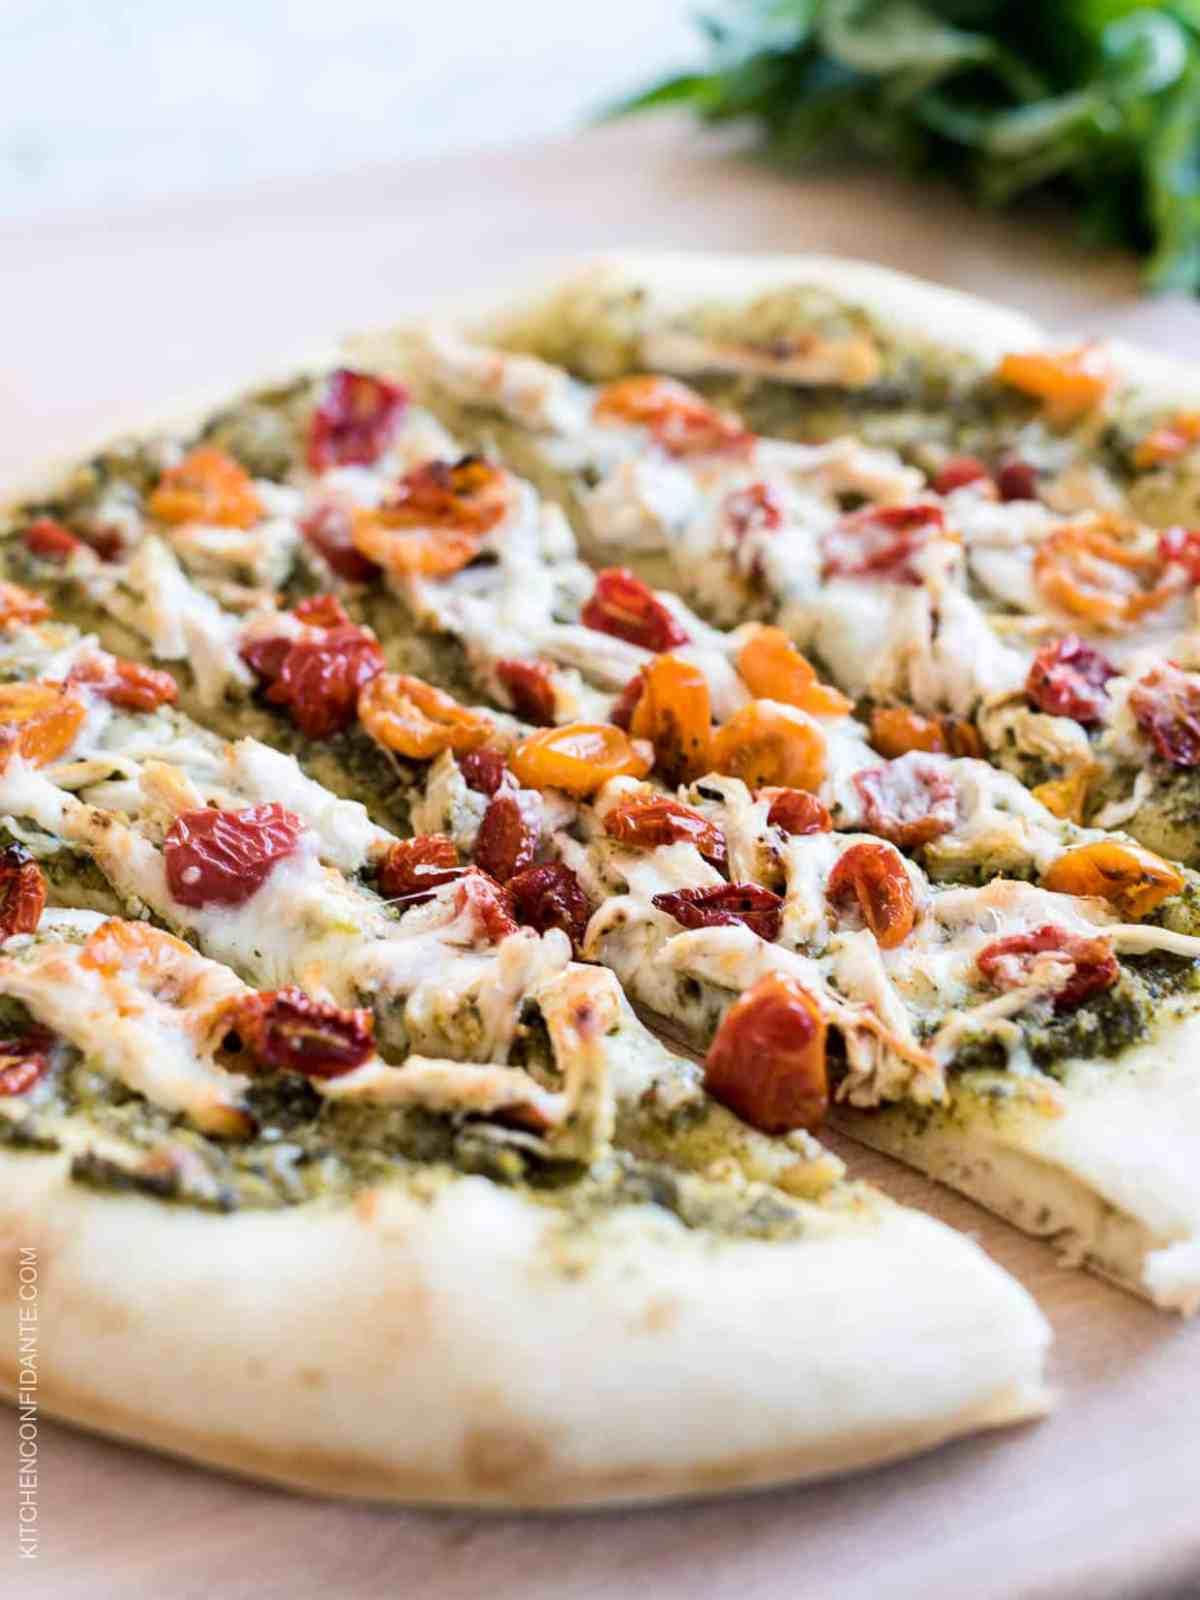 Chicken Pesto Pizza sliced on a wood board.